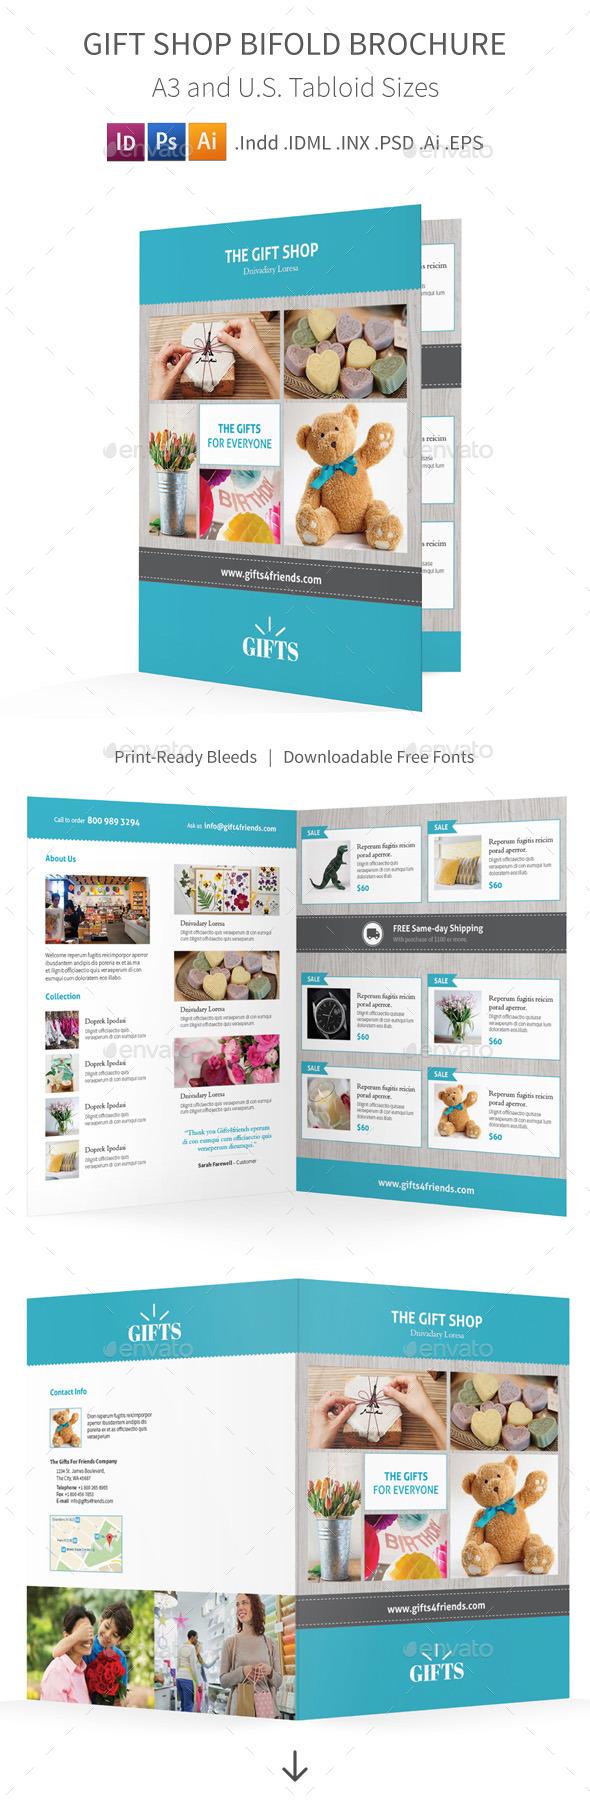 GraphicRiver Gift Shop Bifold Halffold Brochure 11847186